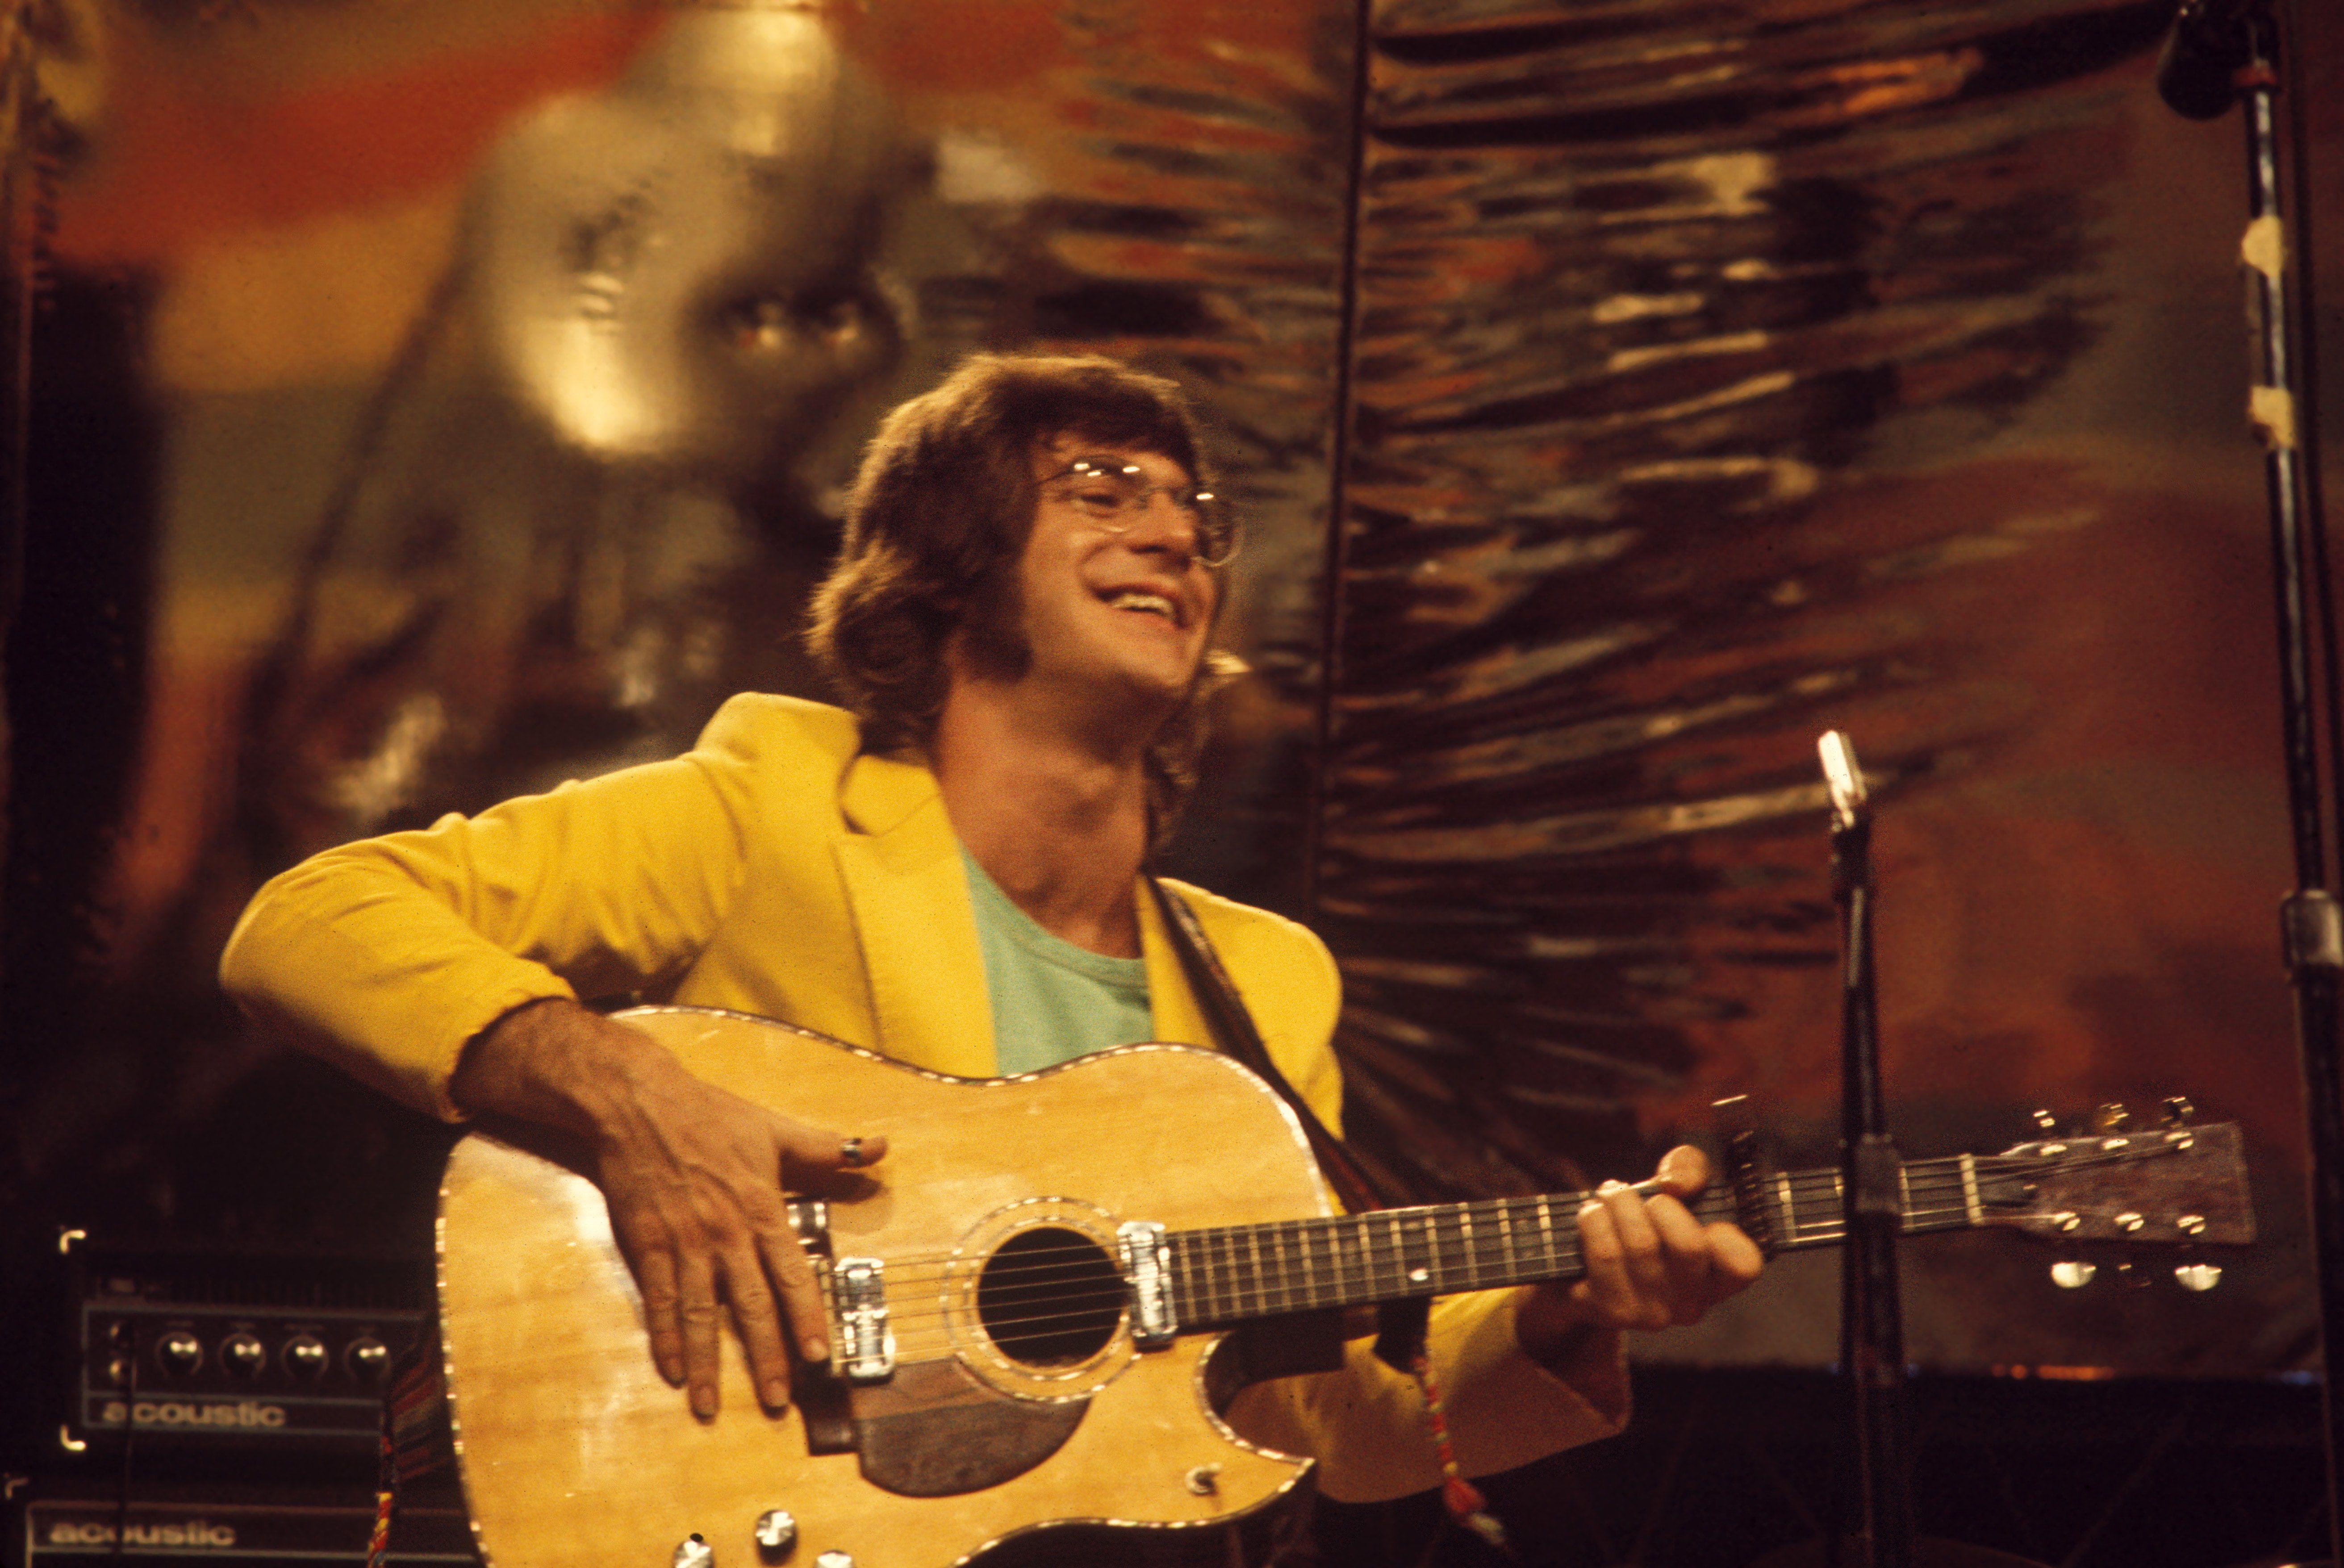 John Sebastian playing acoustic guitar live